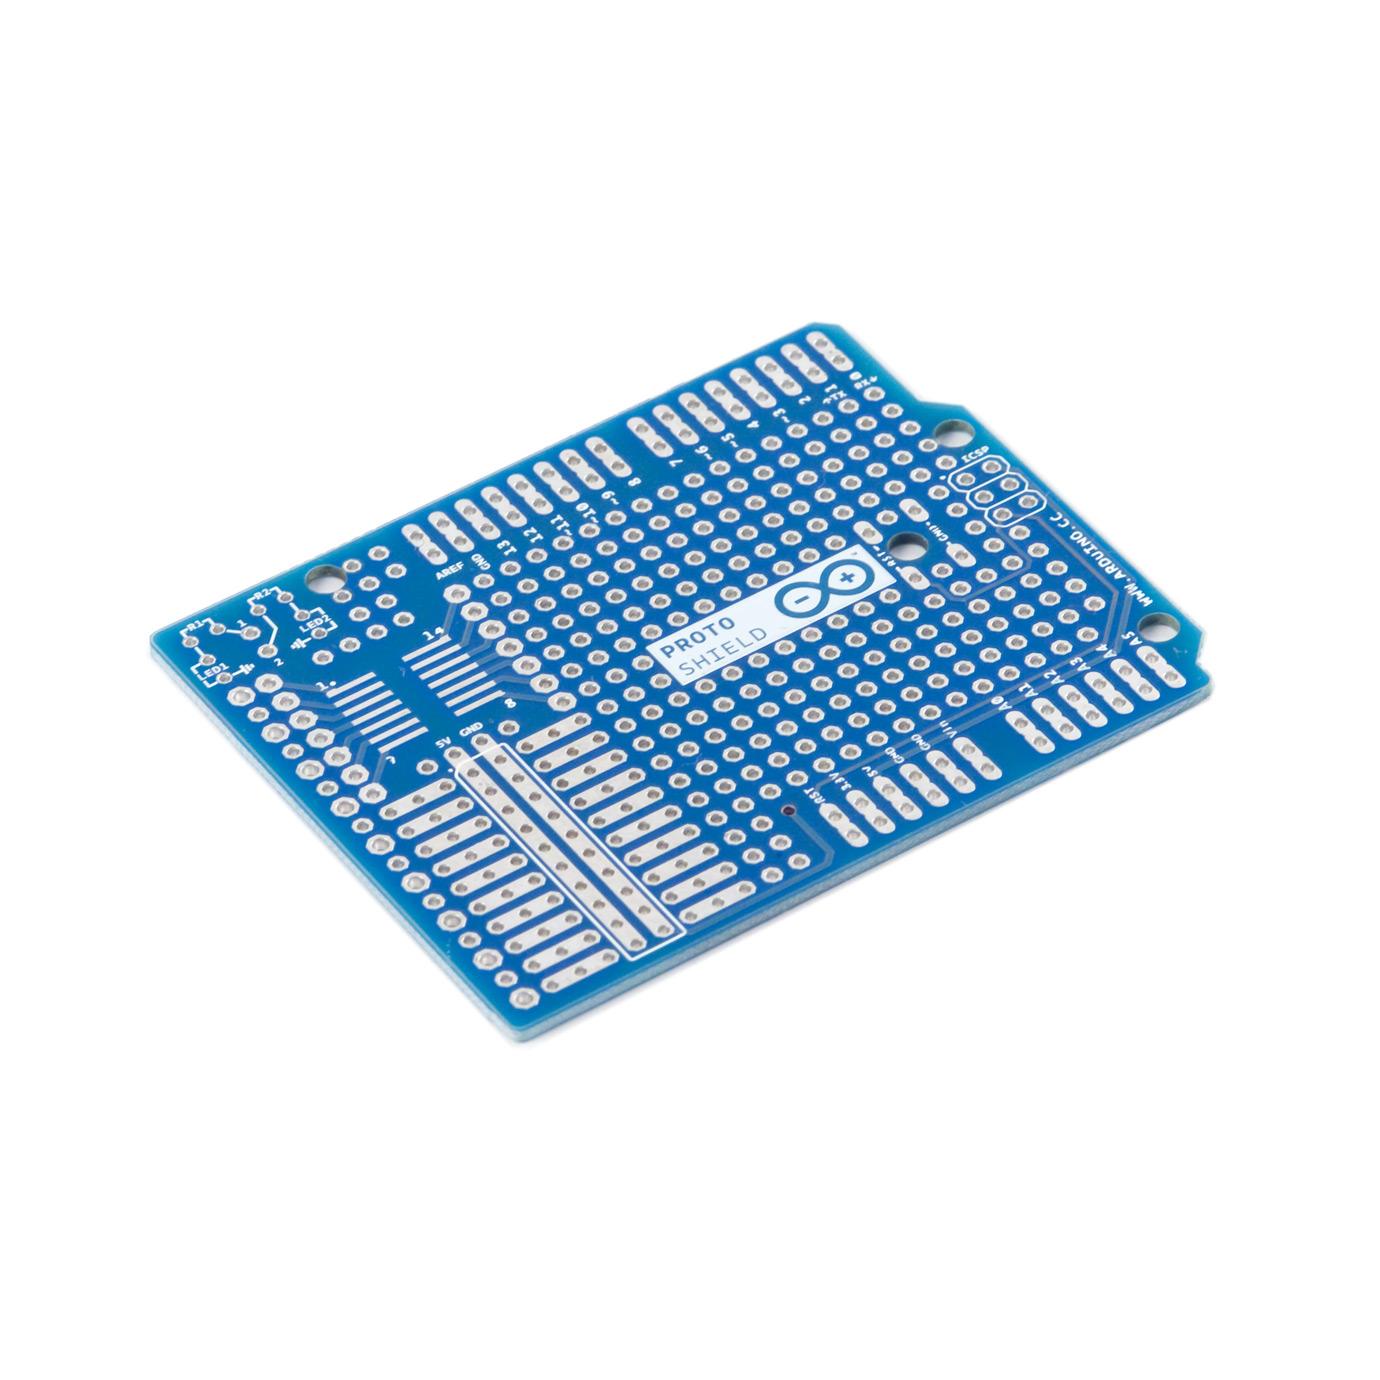 Shield - Proto PCB R3